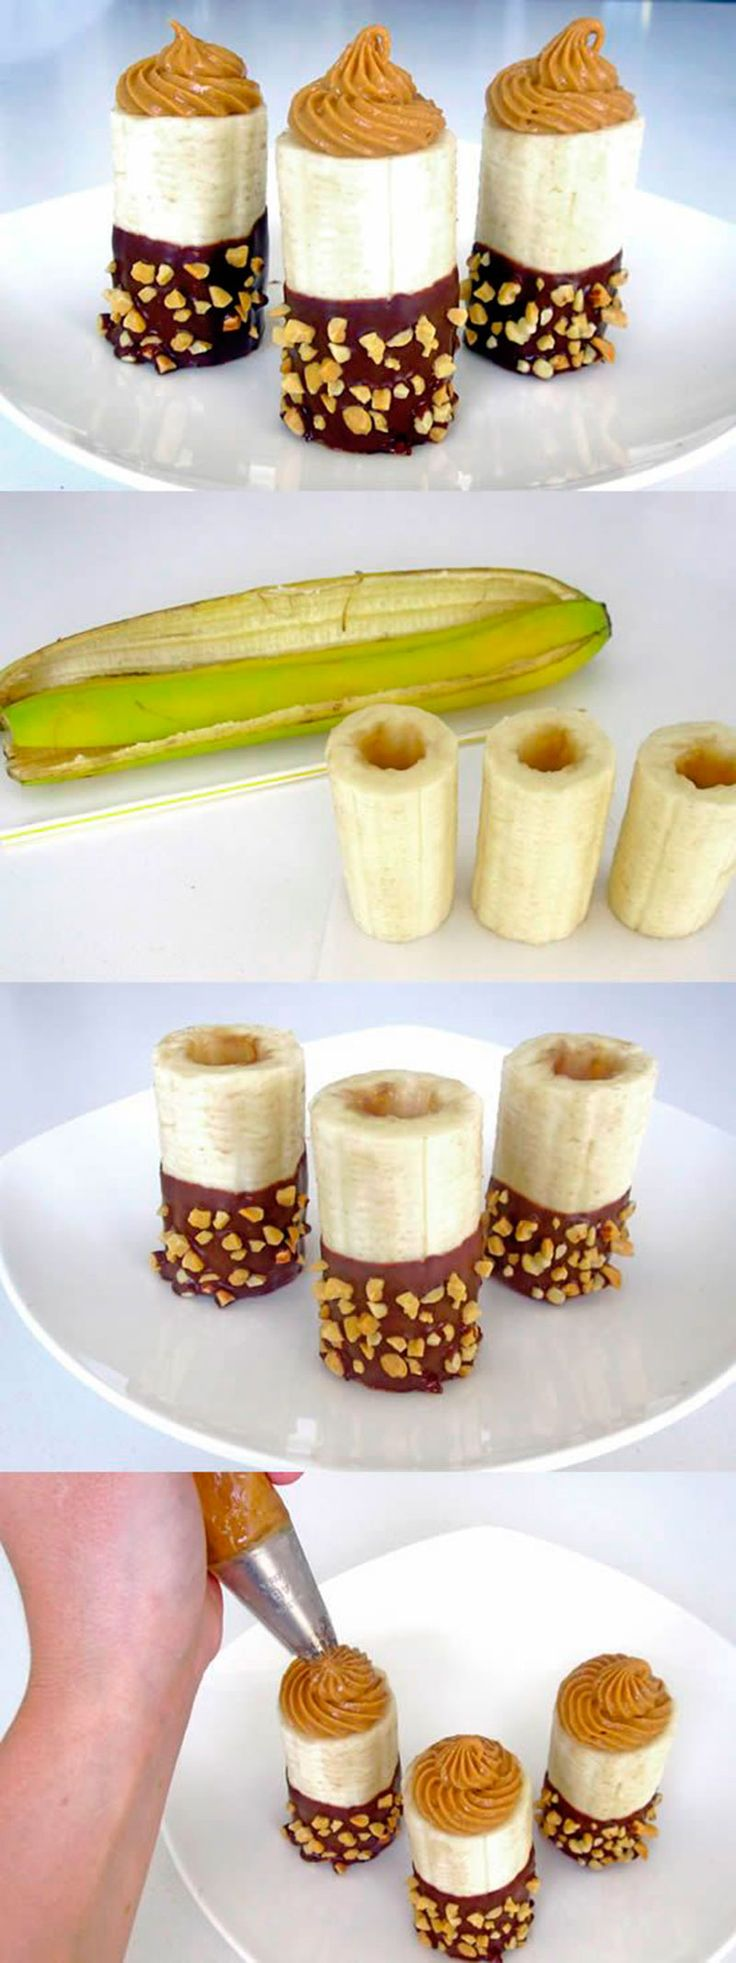 banana delicia